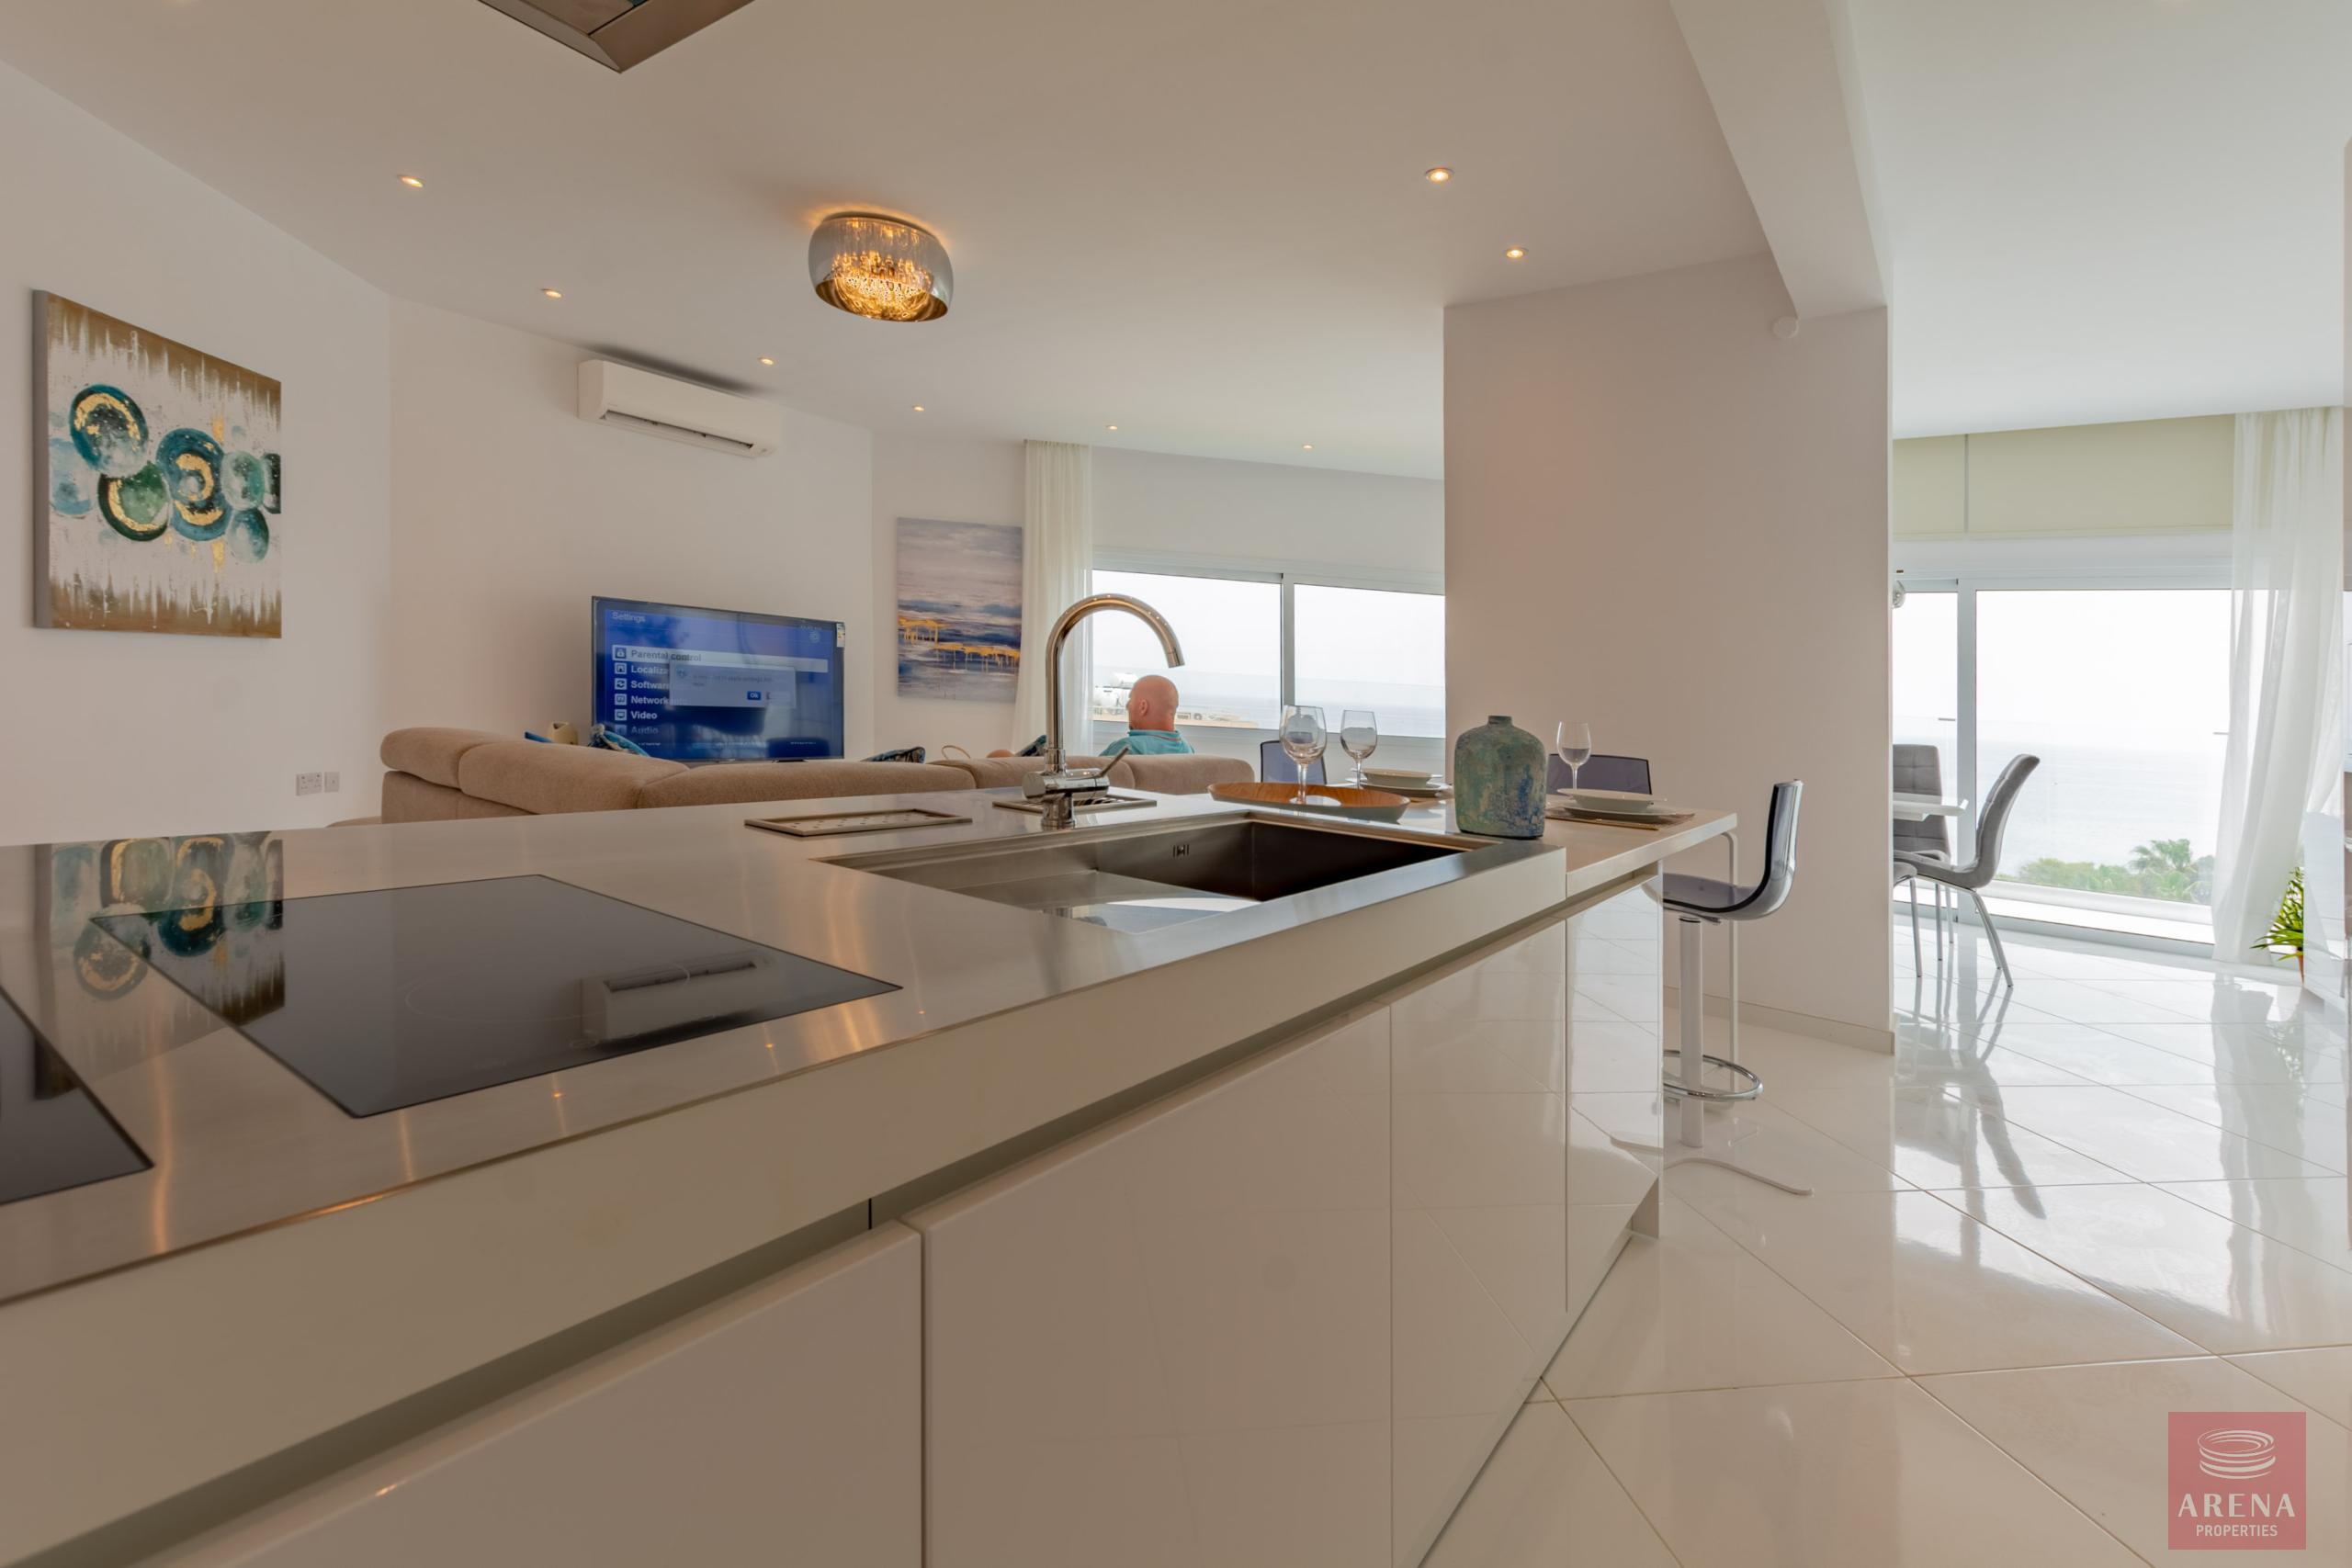 Apartment in Ayia Triada to buy - kitchen